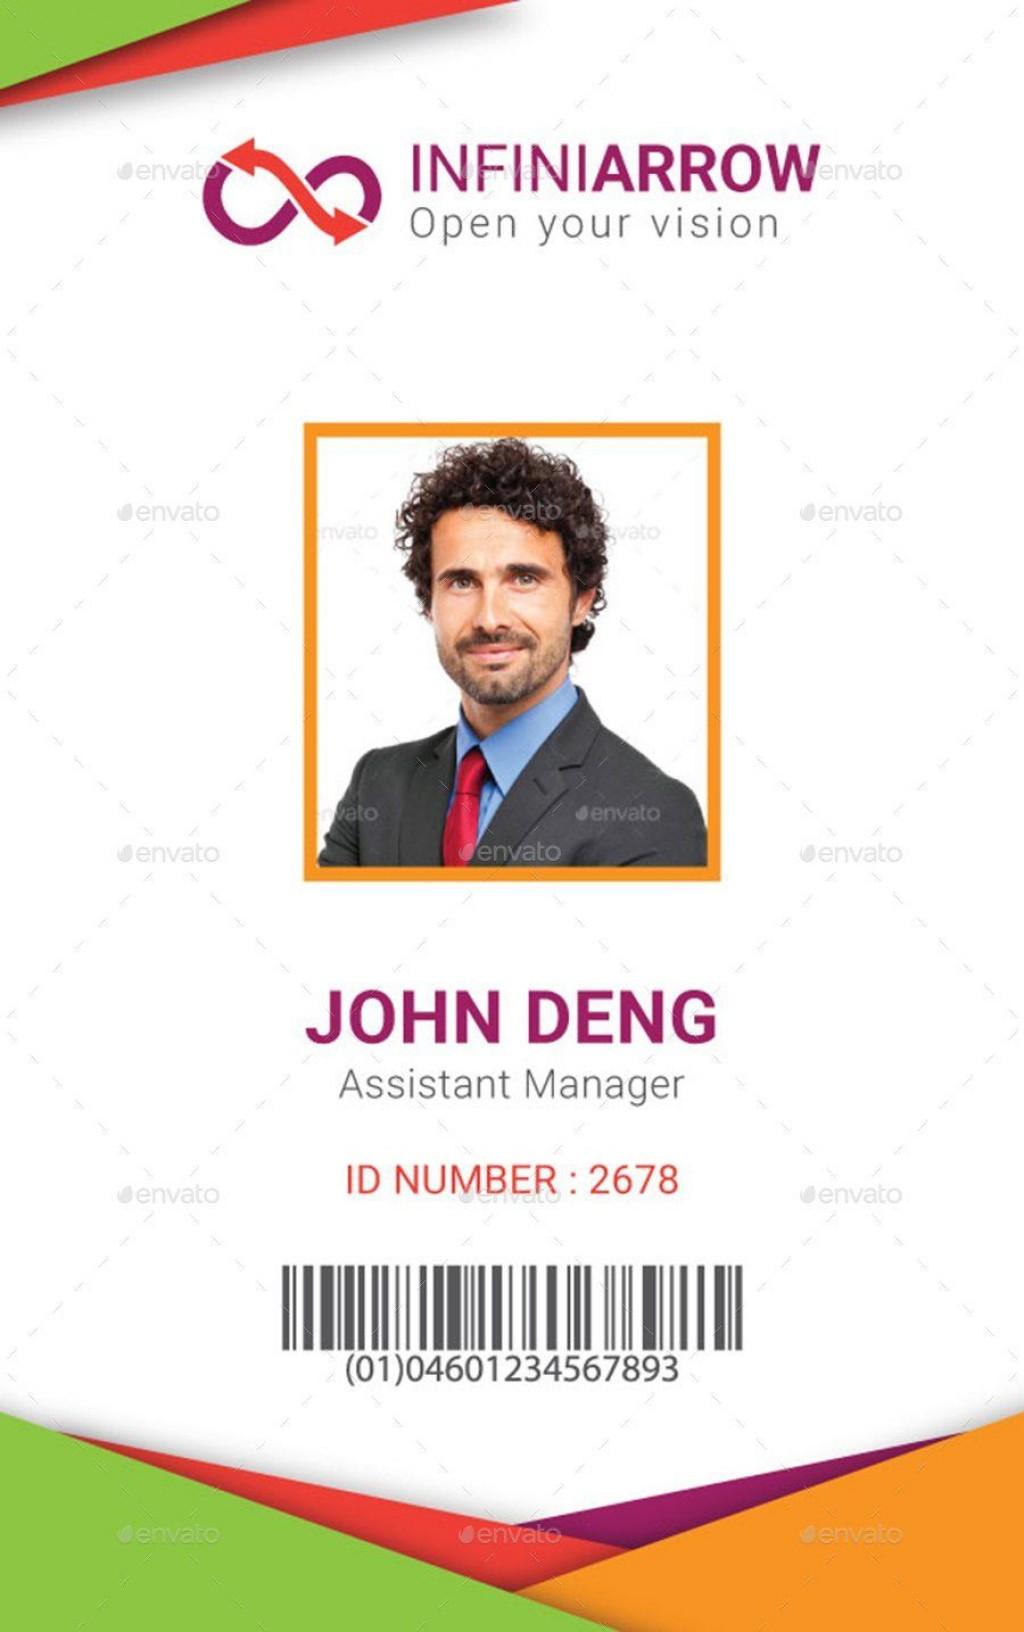 002 Frightening Id Badge Template Word Photo  Free EmployeeLarge